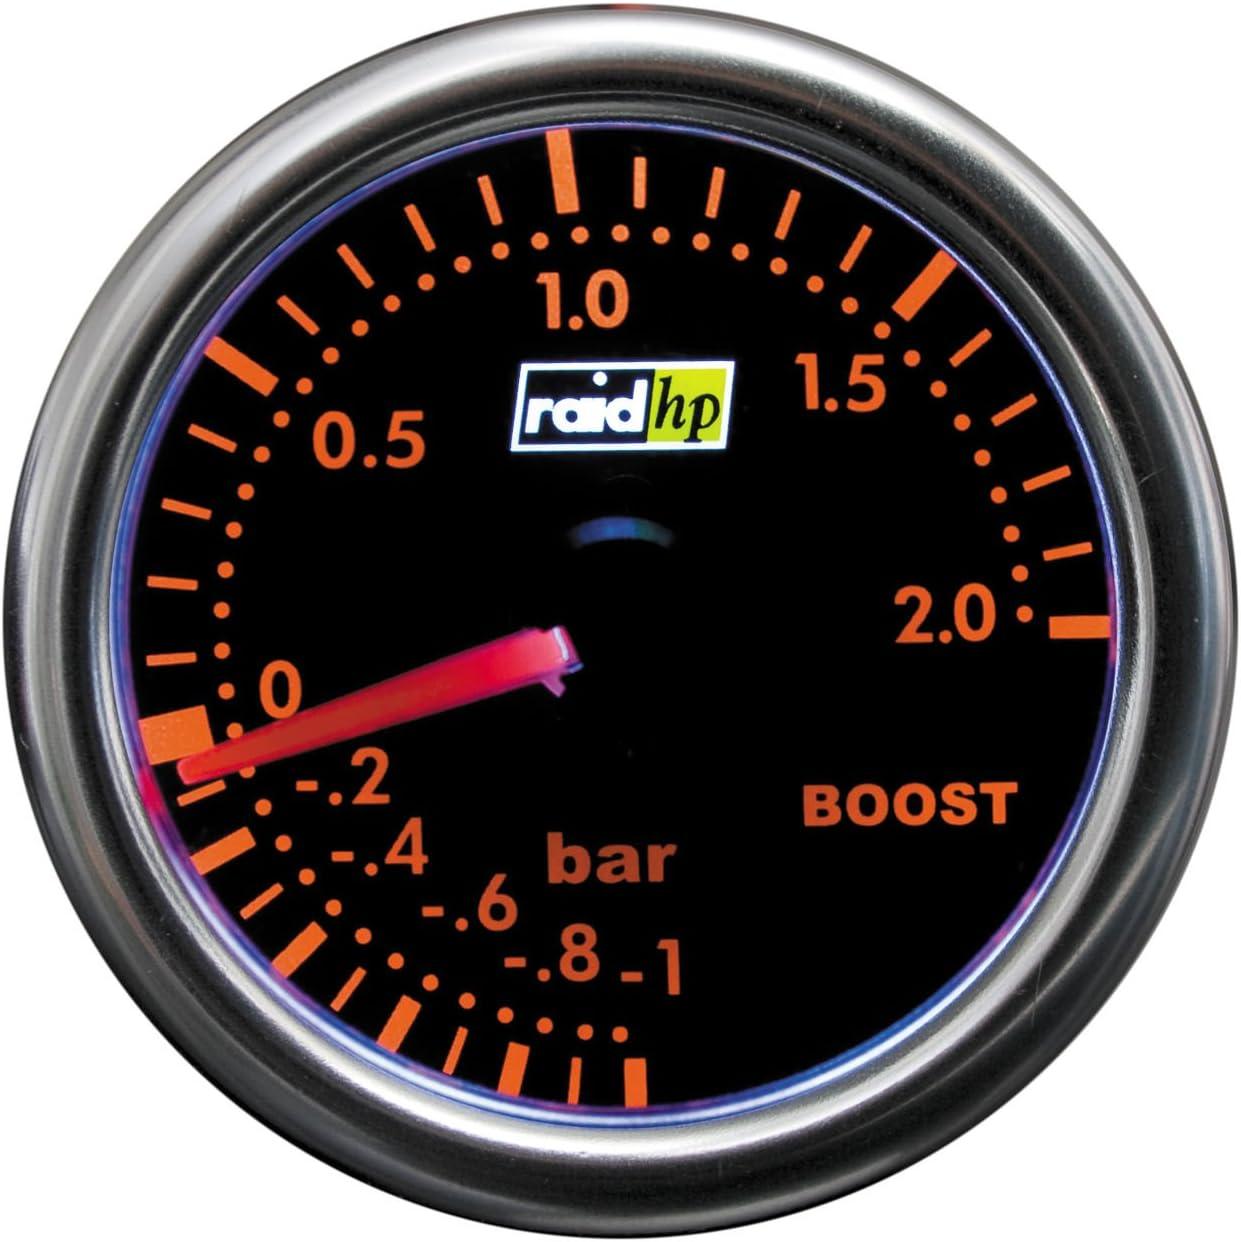 Raid HP Night Flight 660250 Turbo Boost Gauge Display Add-On Instrument/Red